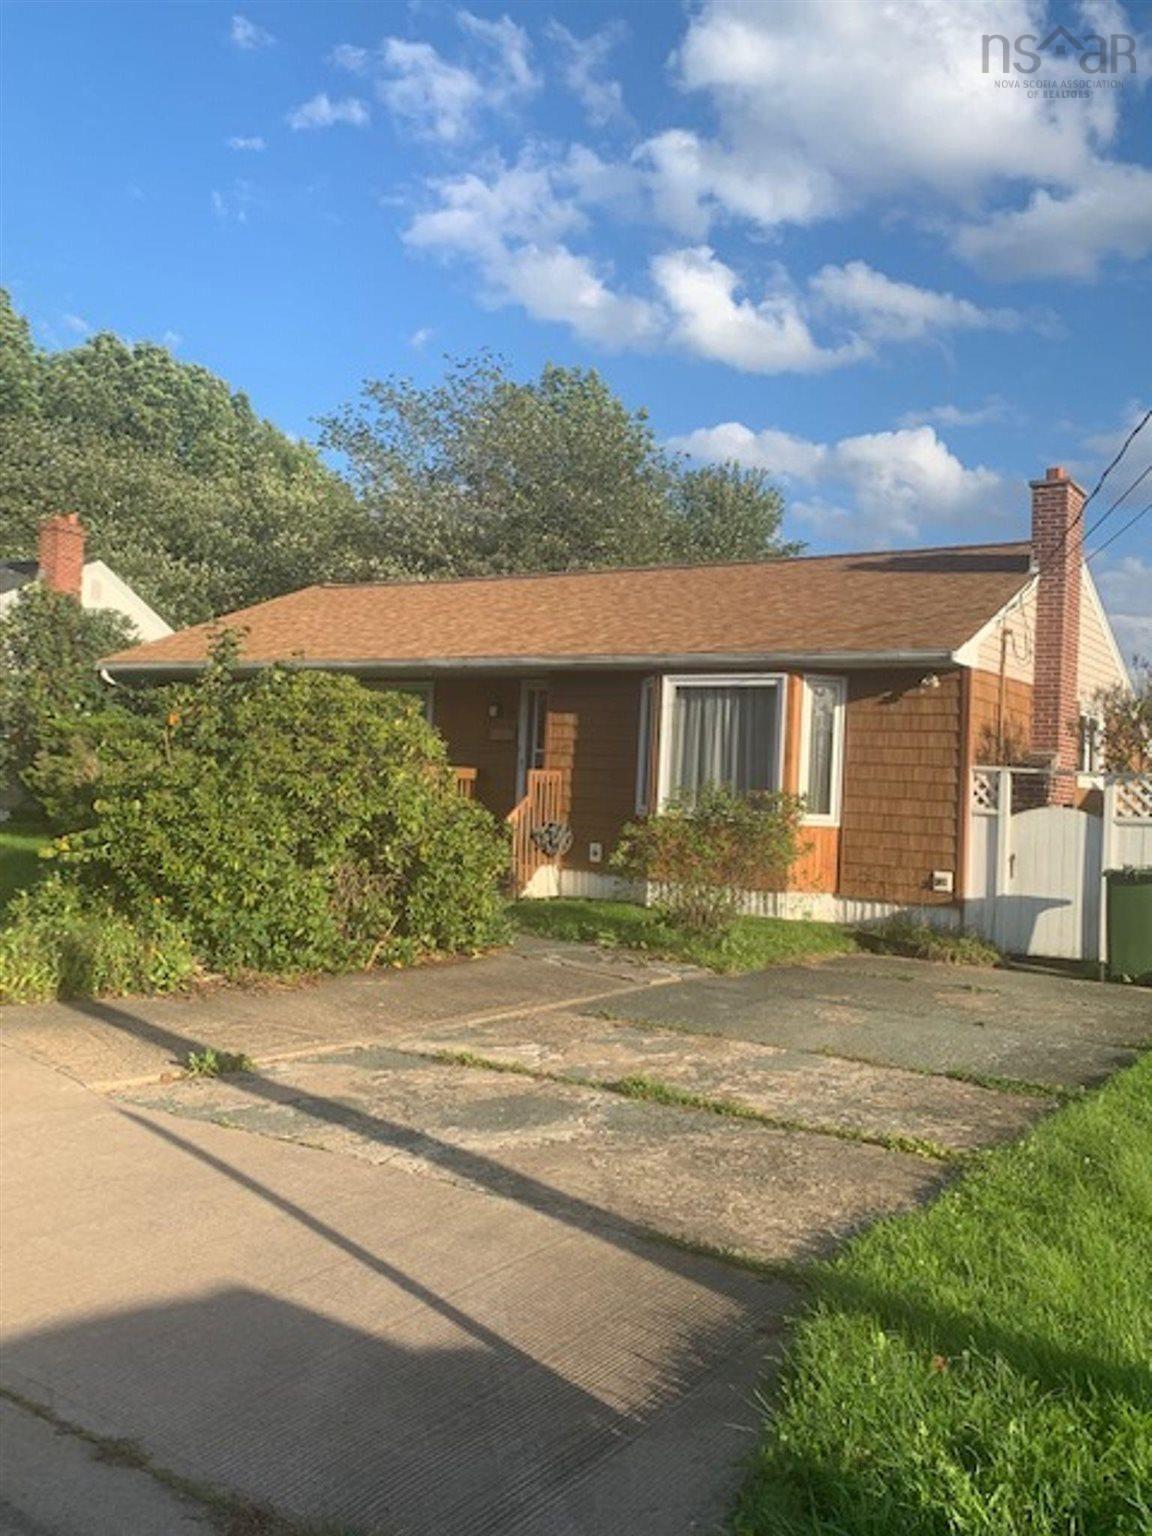 Main Photo: 37 Stephen Cross Drive in Woodlawn: 17-Woodlawn, Portland Estates, Nantucket Residential for sale (Halifax-Dartmouth)  : MLS®# 202123599